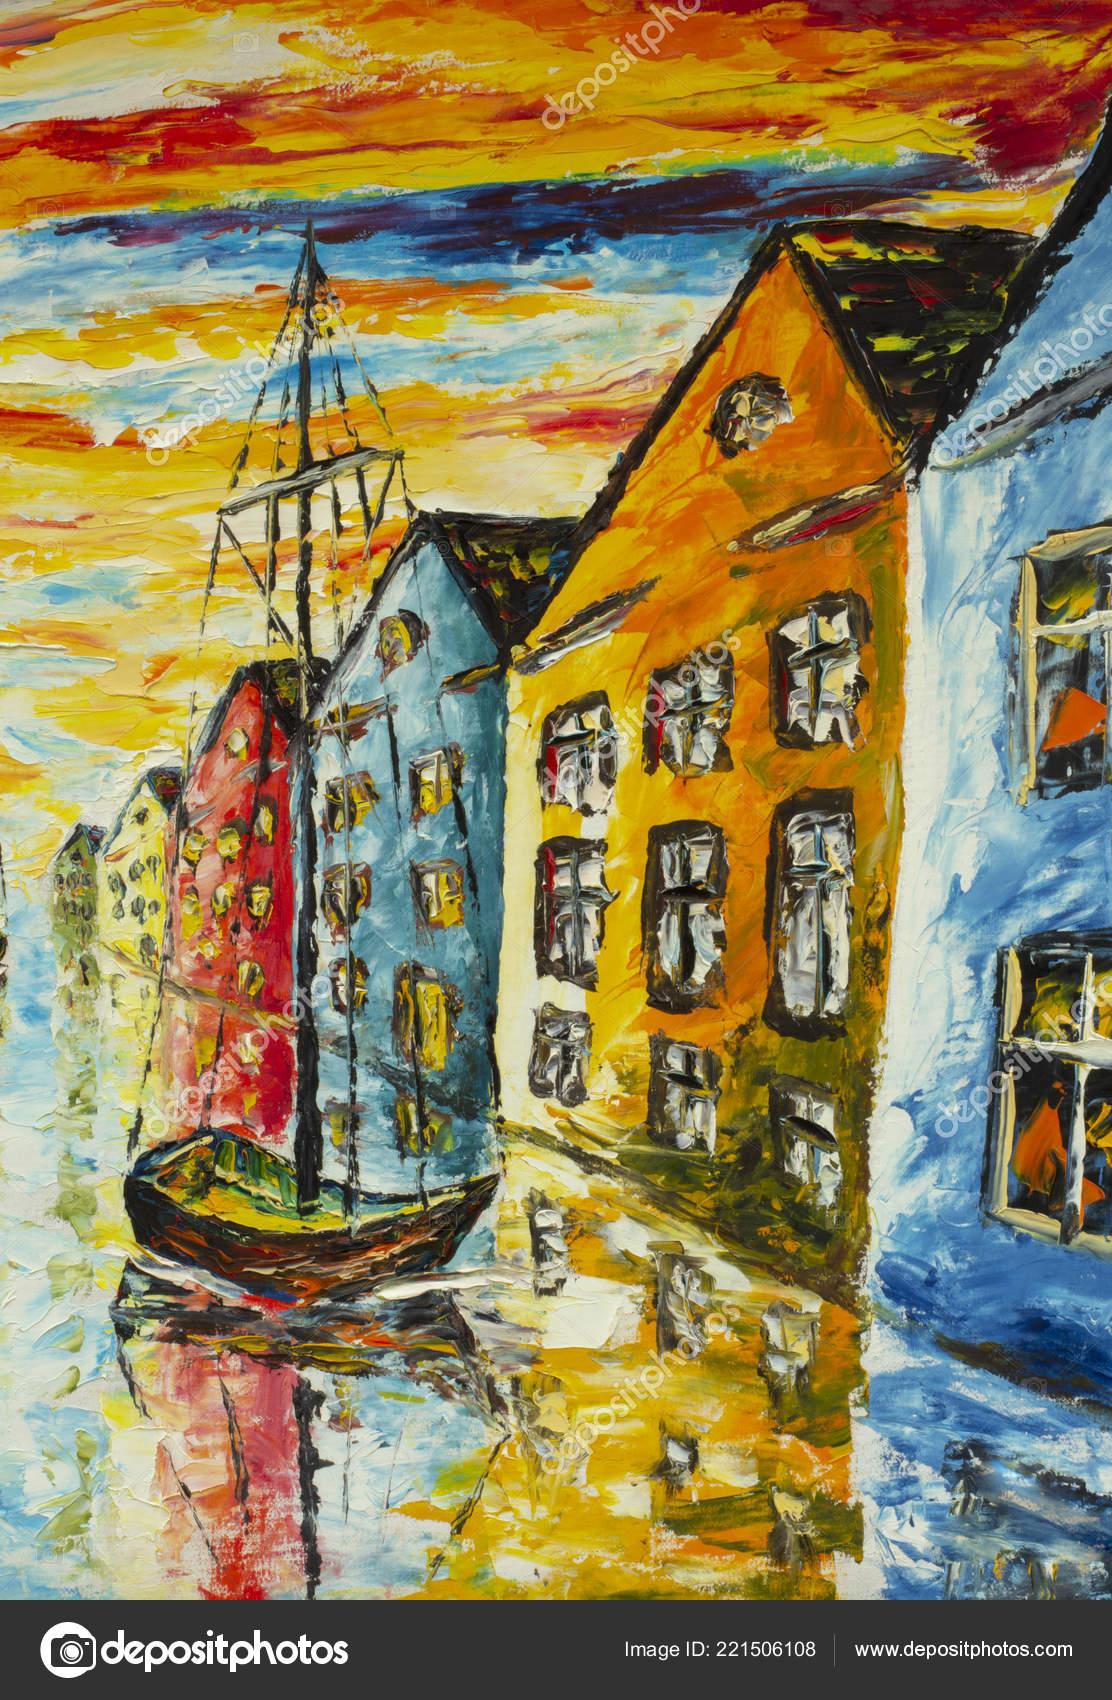 Vaak Originele Kunst Olie Paletmes Canvas Venetië Amsterdam Schilderen &GR01